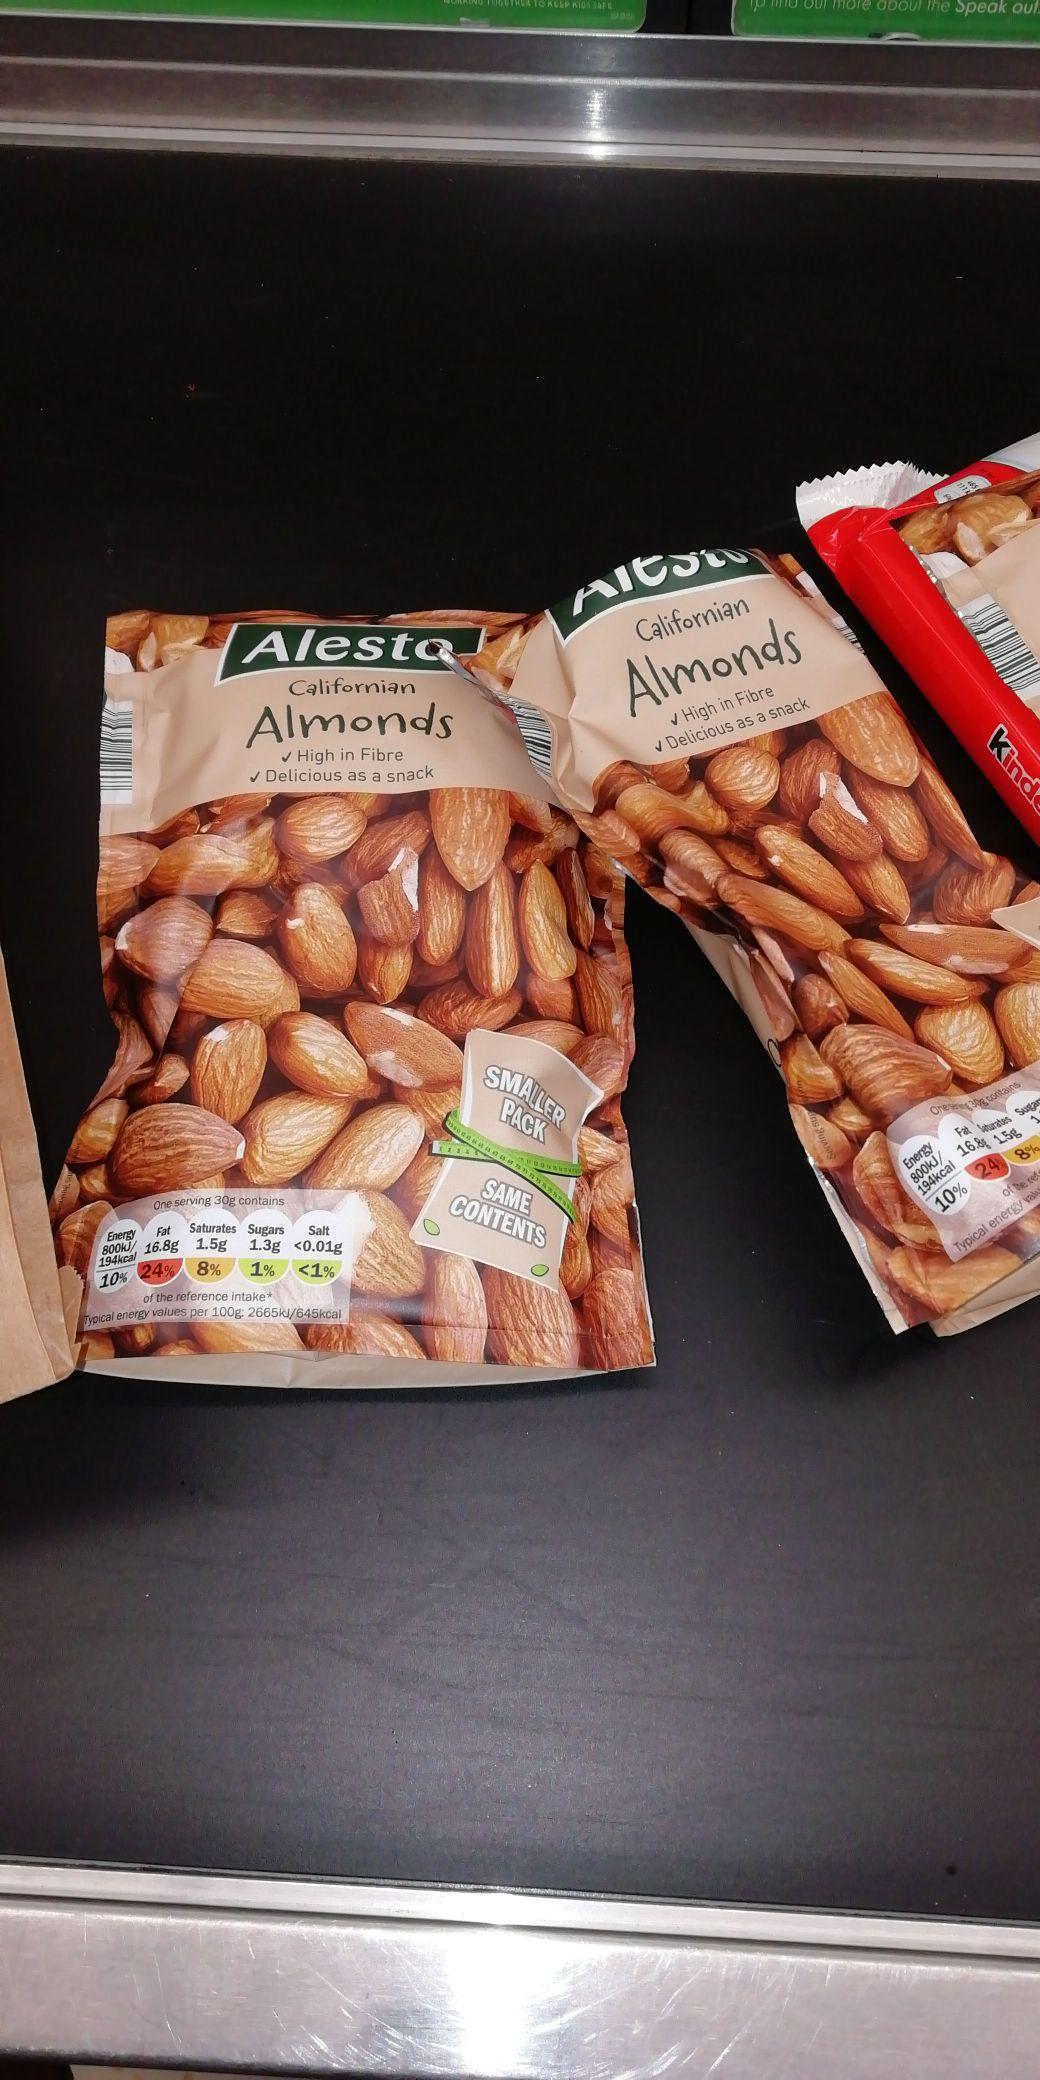 200g Almonds in Lidl £1.29 weekend offer